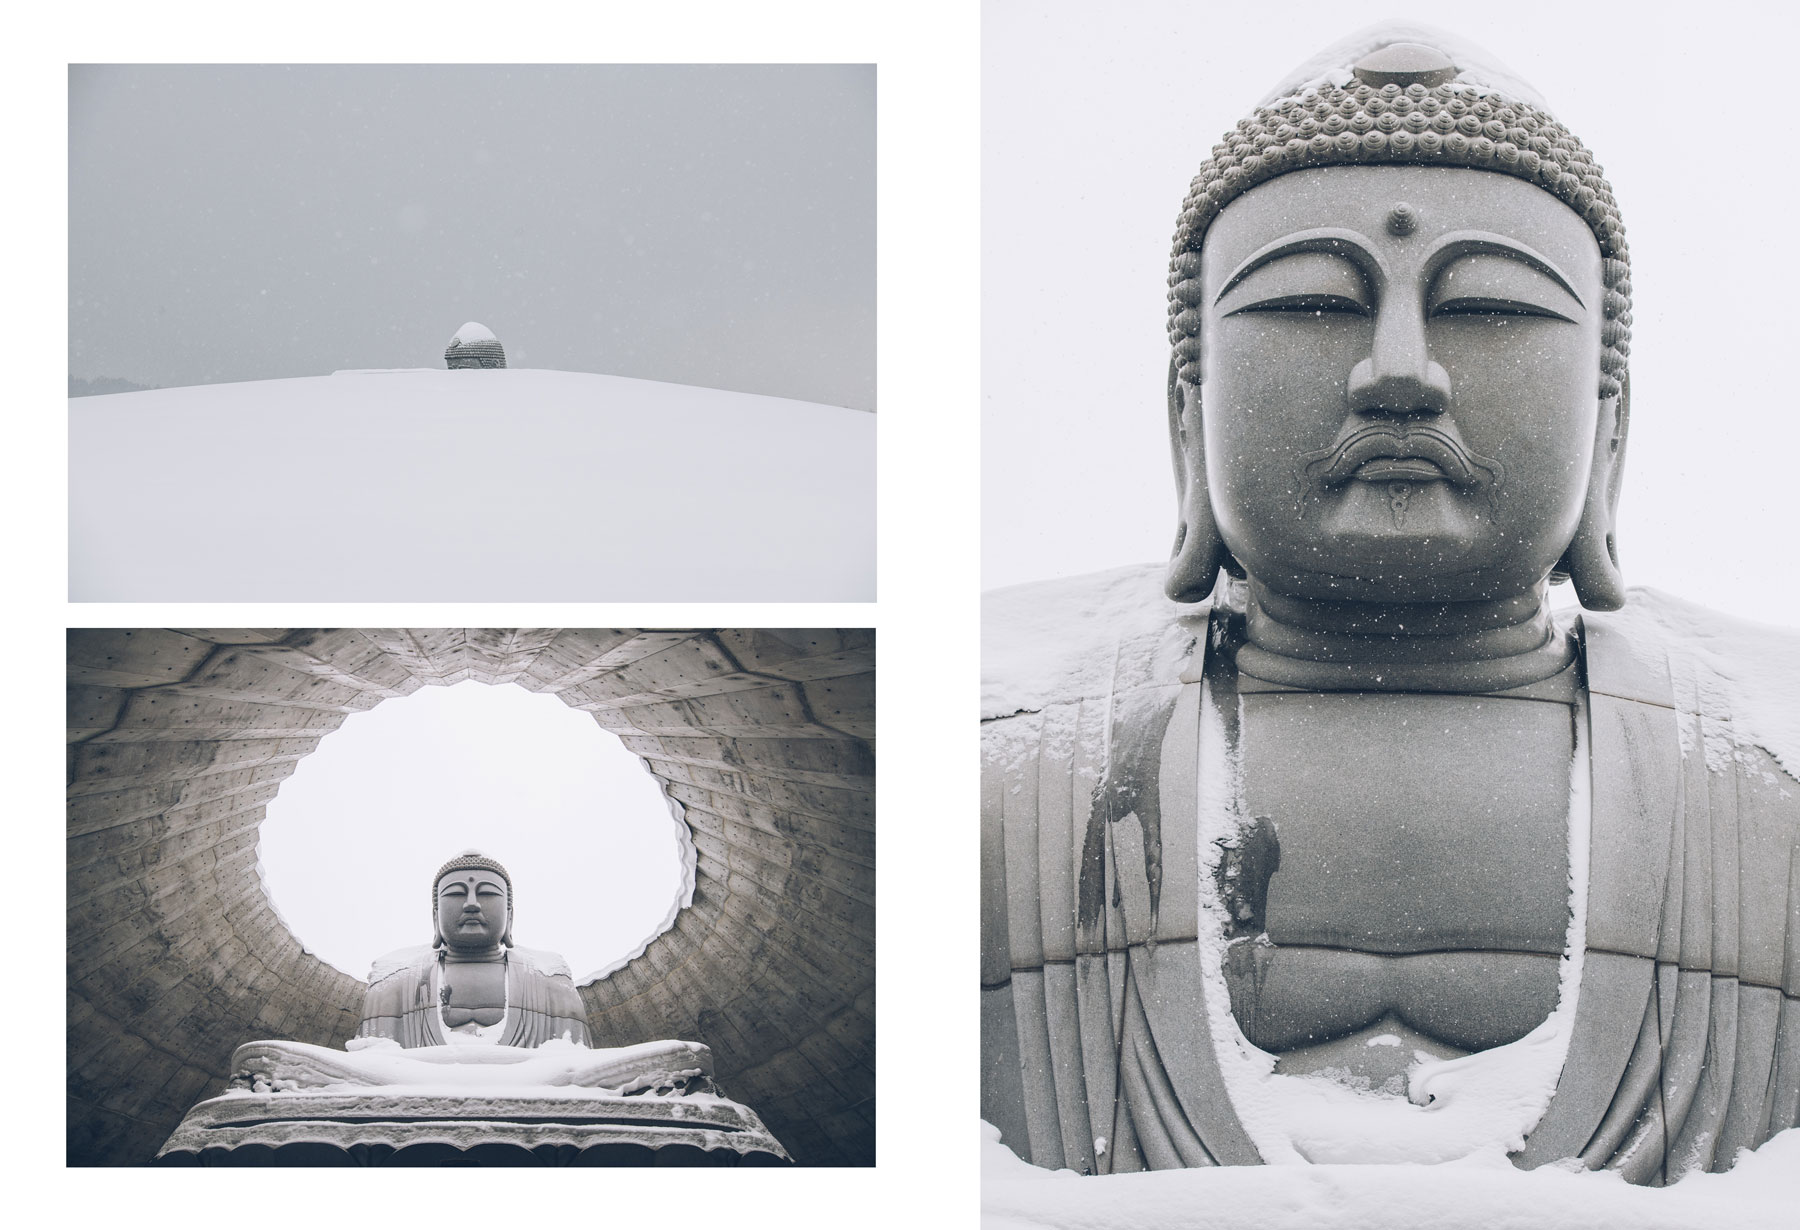 Makomanai Takino Cementary, Hokkaido, Buddha